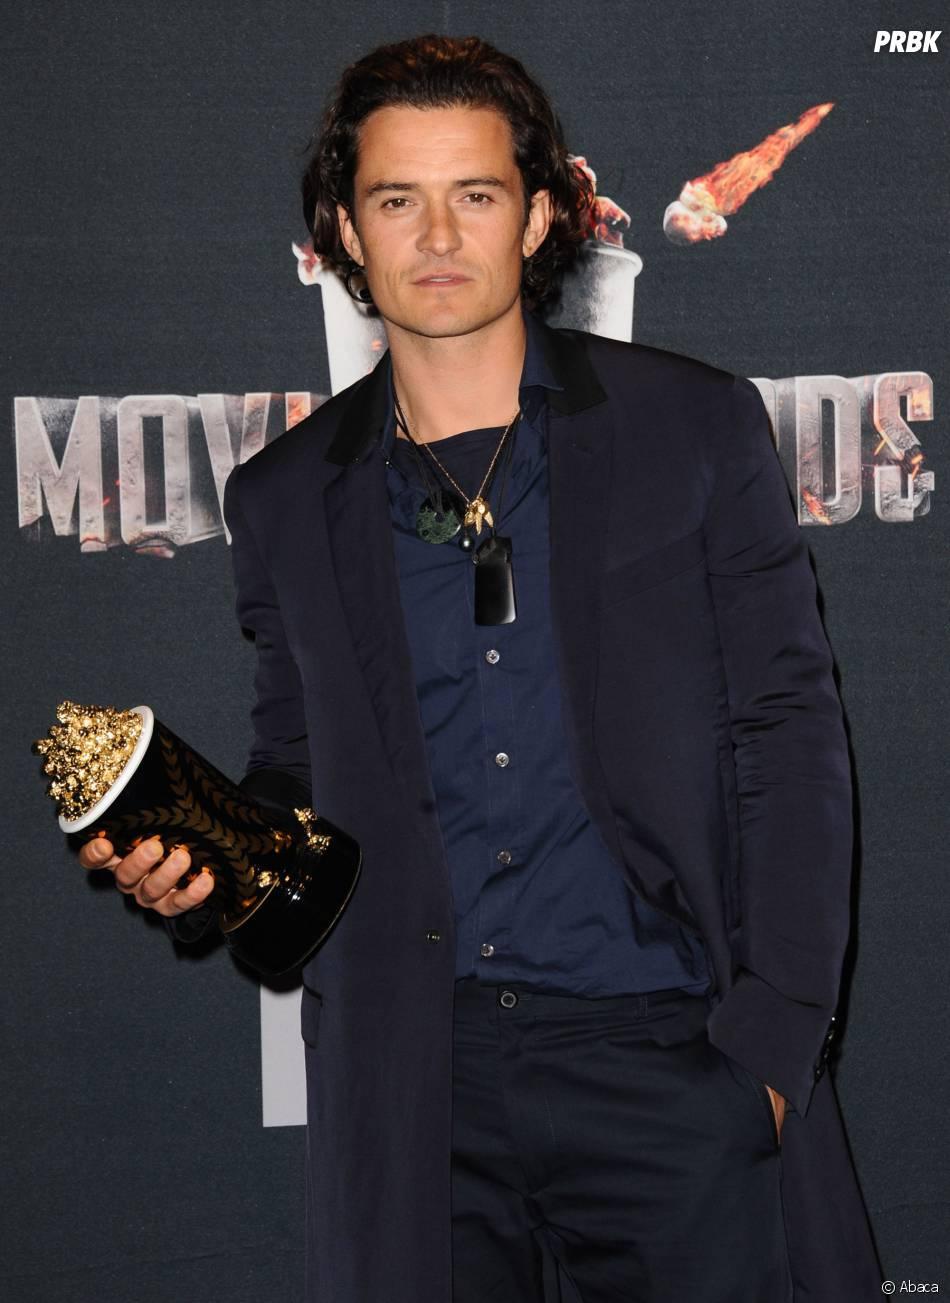 Orlando Bloom pose avec son prix aux MTV Movie Awards 2014 le 13 avril 2014